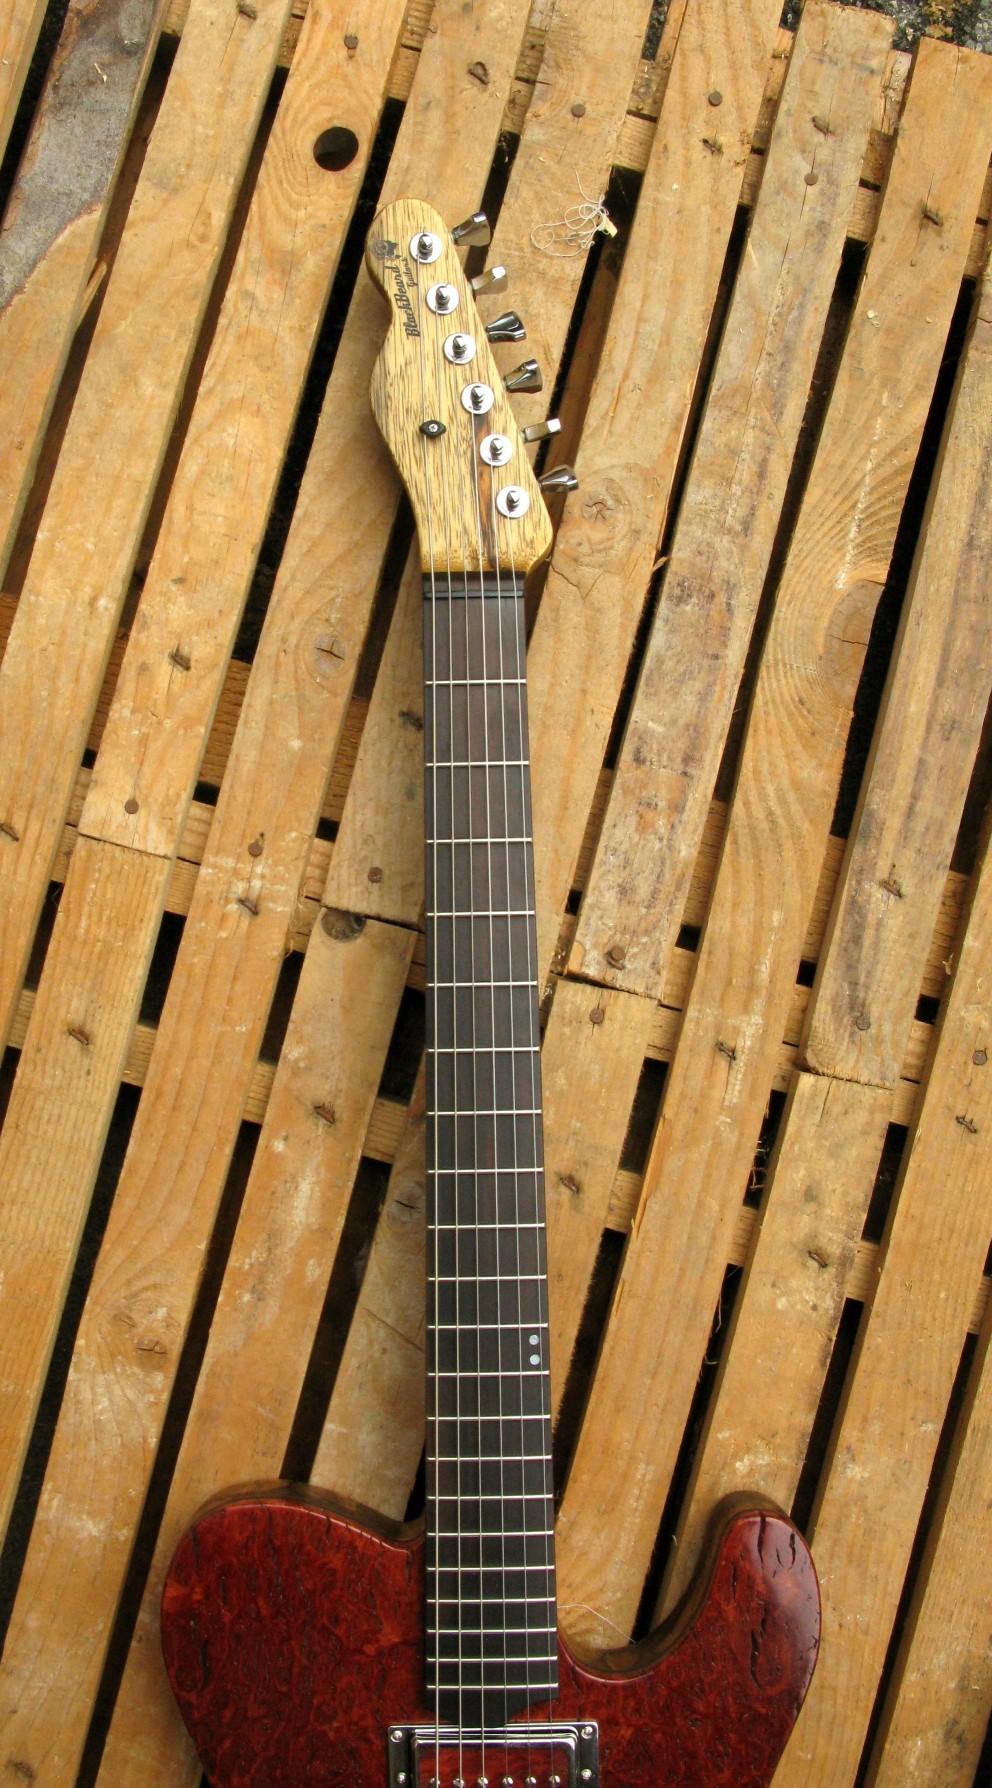 Tastiera in ebano di una chitarra Telecaster in black korina e top burl red